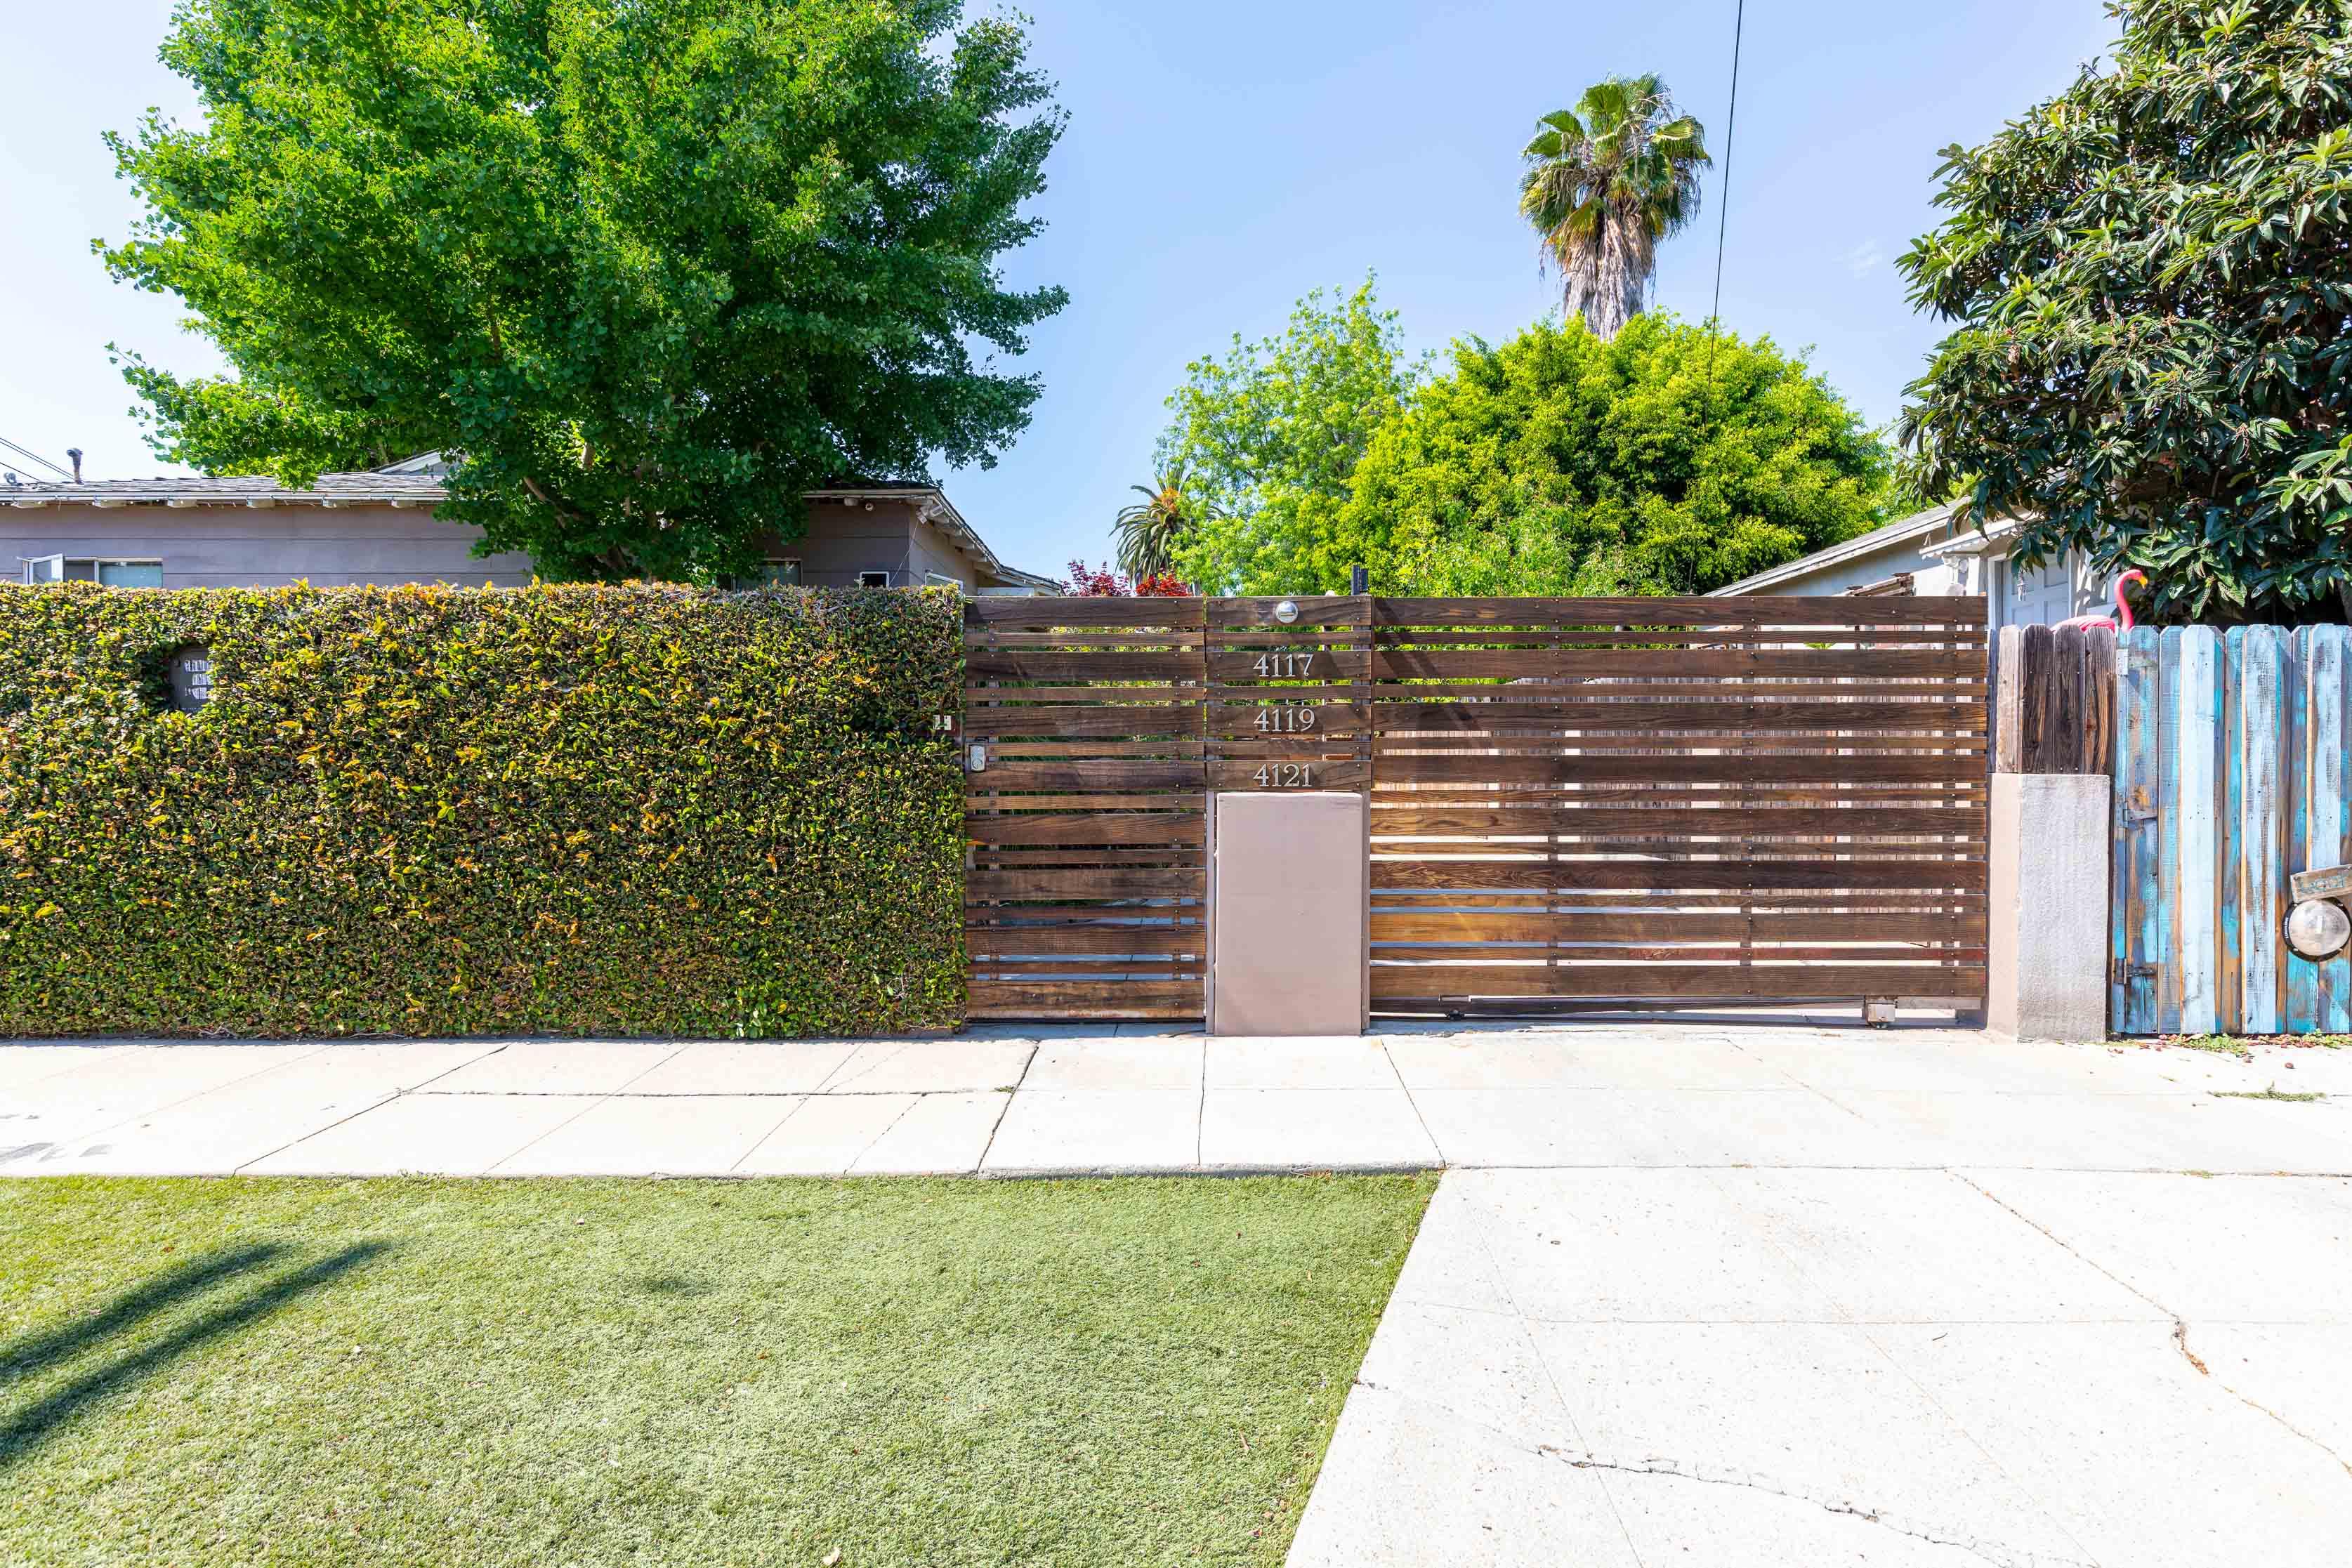 Tranquil Los Feliz Abode | 1 Bedroom/ 1 Bath Triplex | Common Outdoor Space | Completely Renovated!